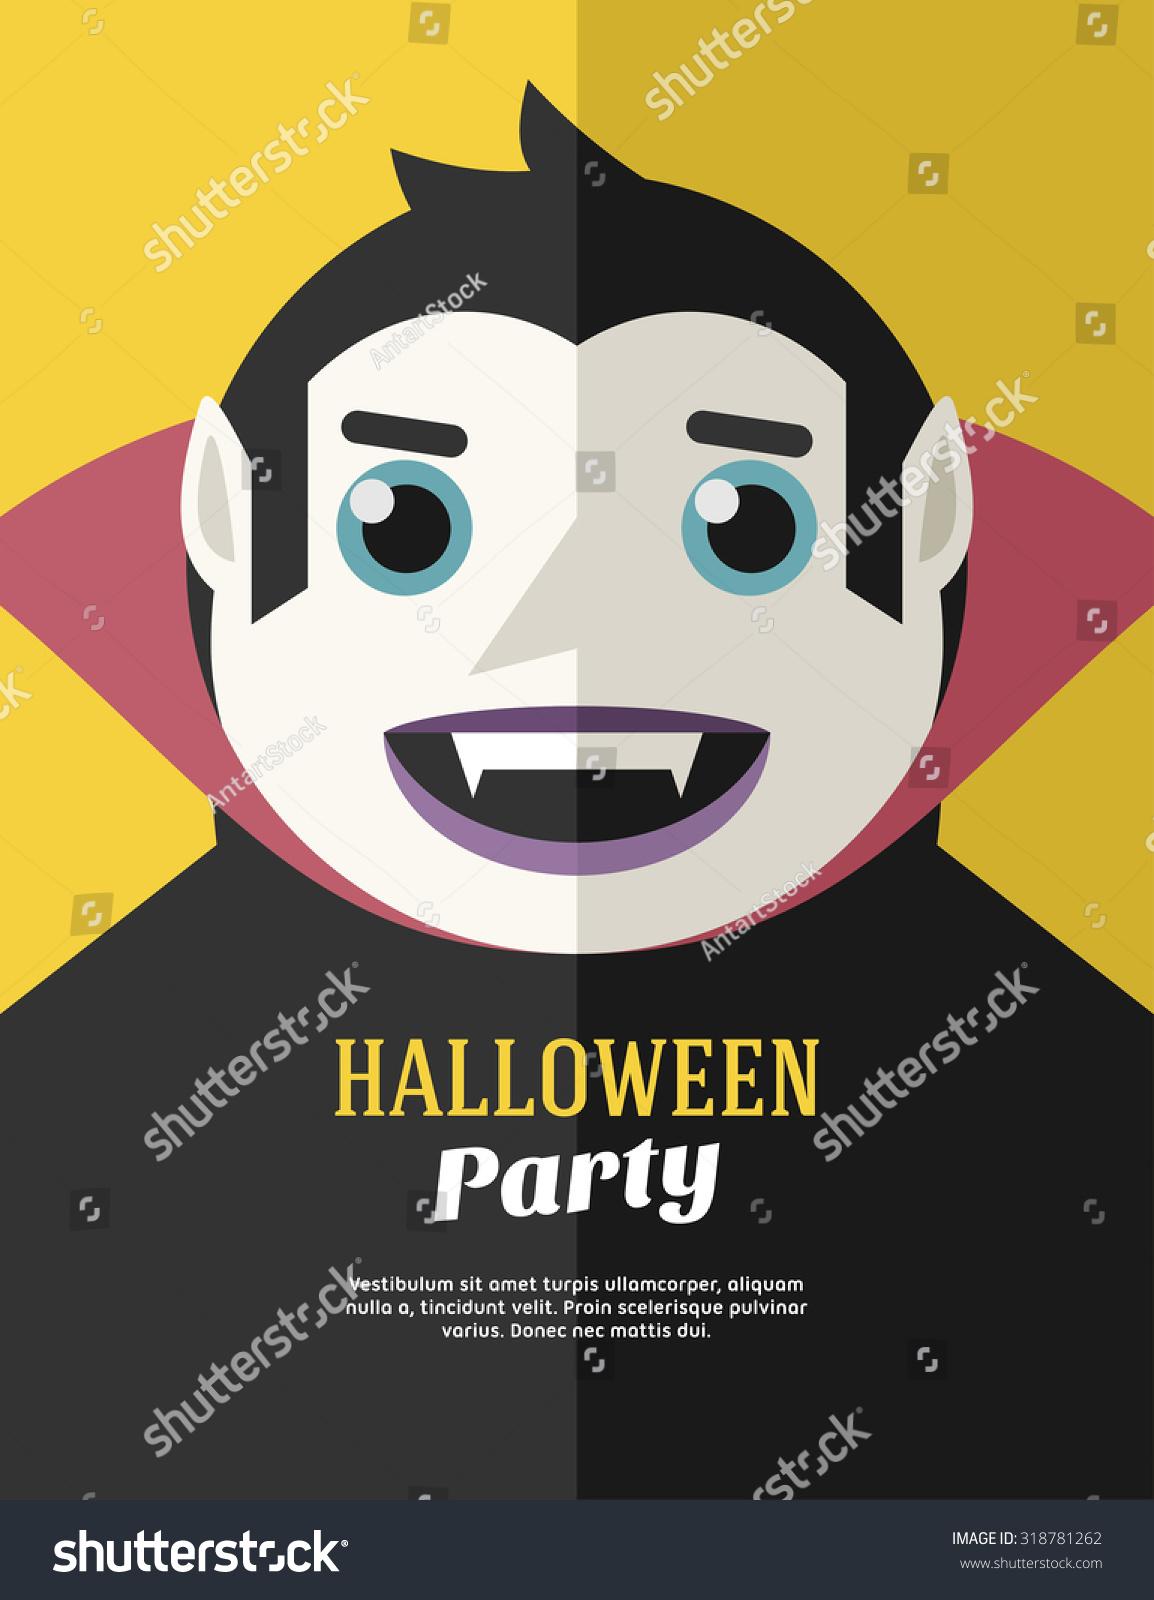 Halloween Party Flyer Poster Vector Template Stock Vector ...